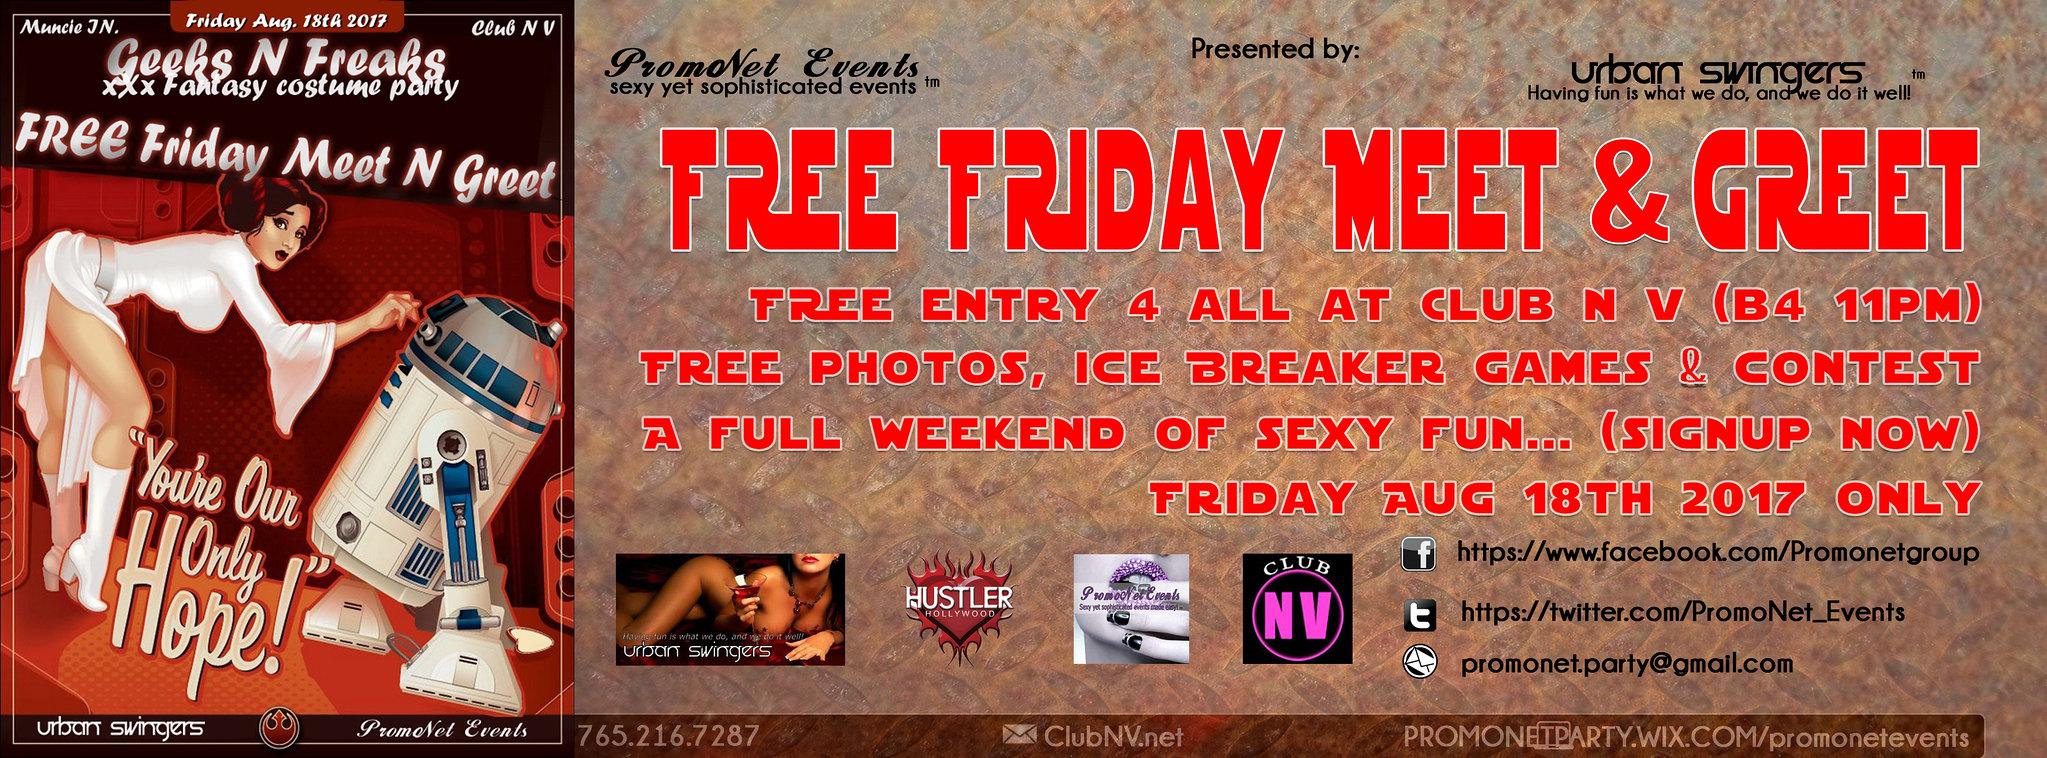 FREE Friday Meet & Greet Aug 18th